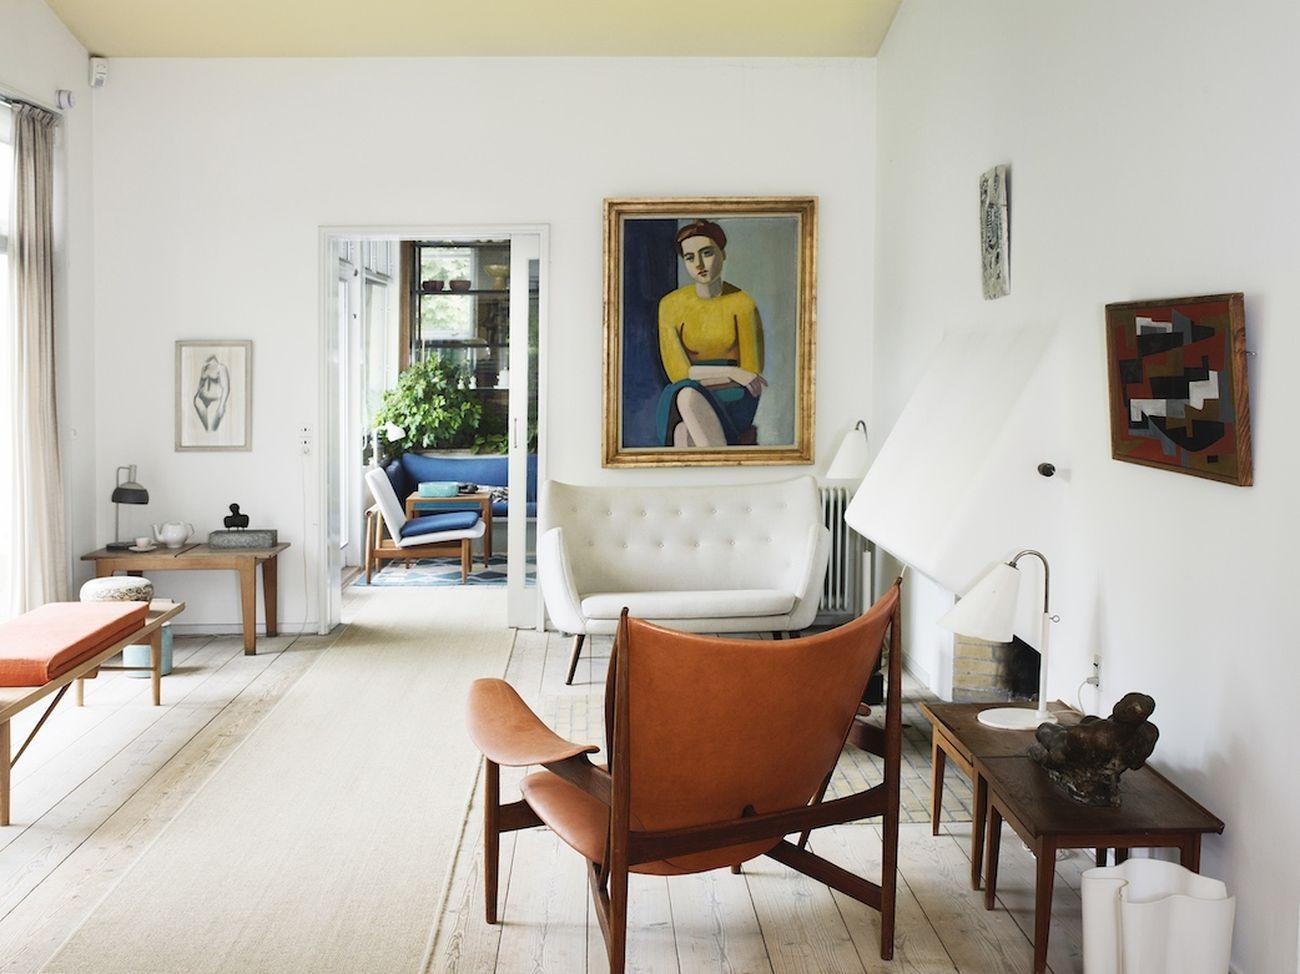 Finn Juhl House, Ordrup, Danimarca, 1941. Photo Henrik Sorensen Photography, 2013